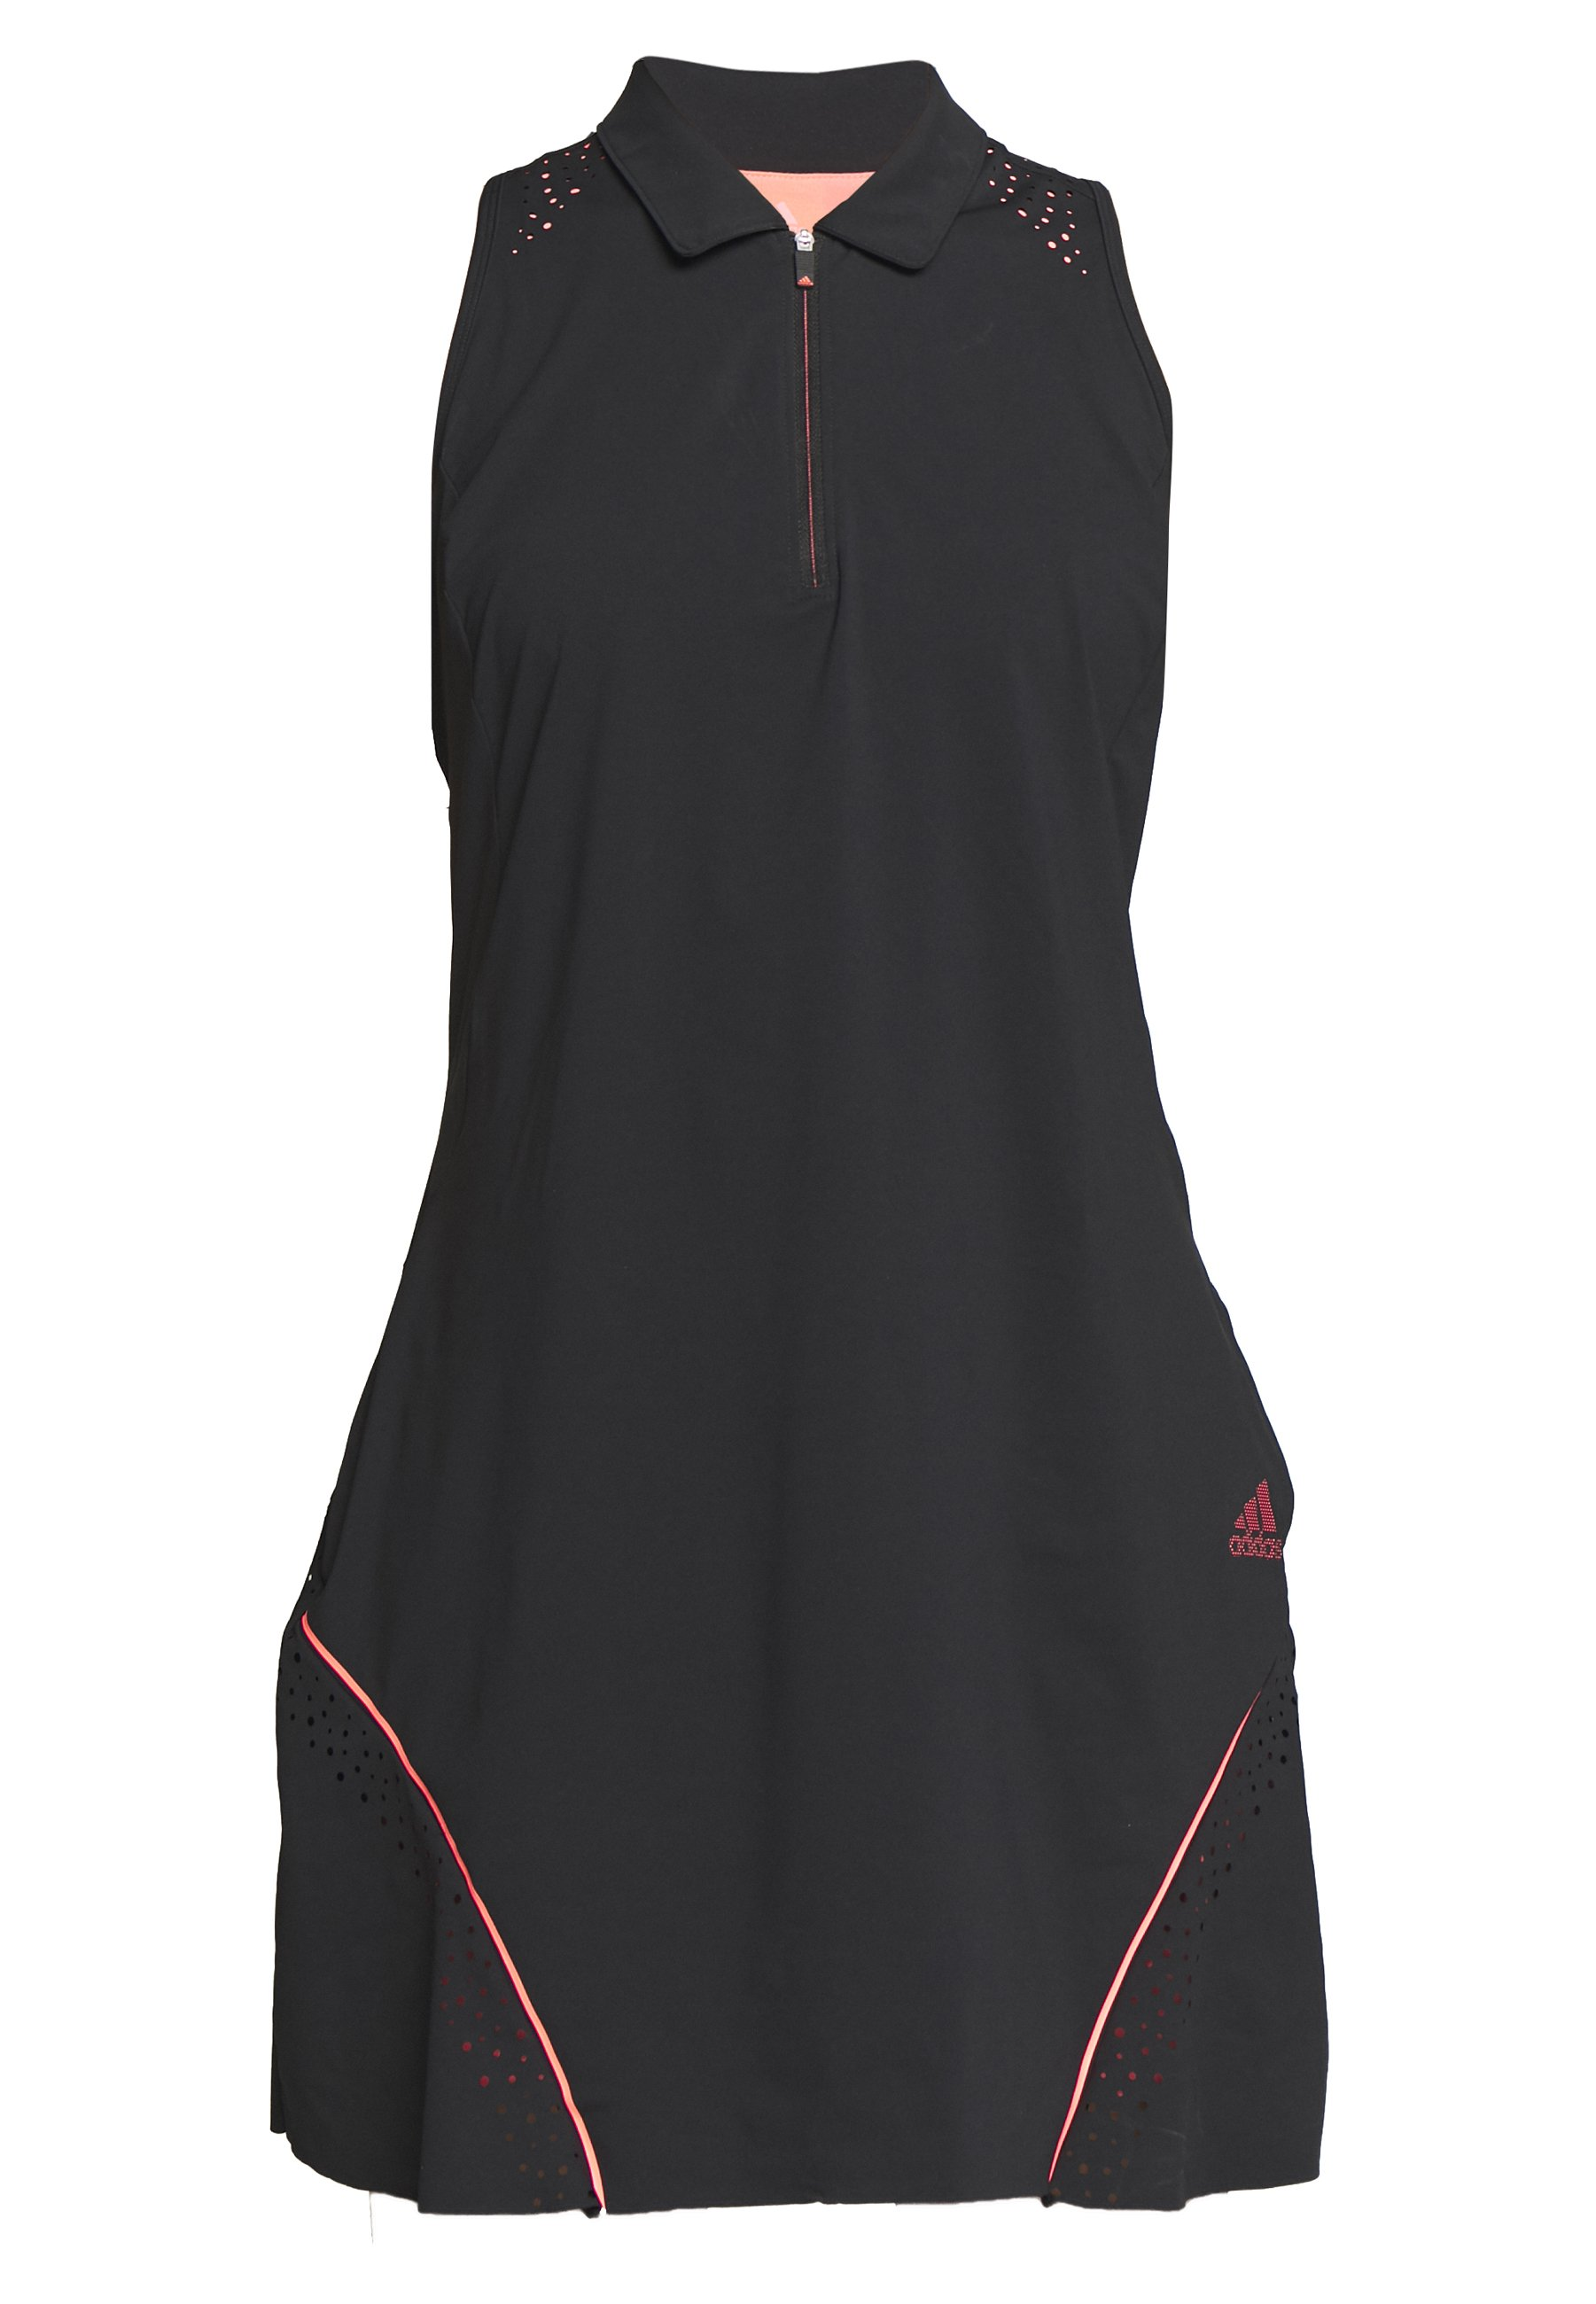 Adidas Golf Dress - Jersey Black